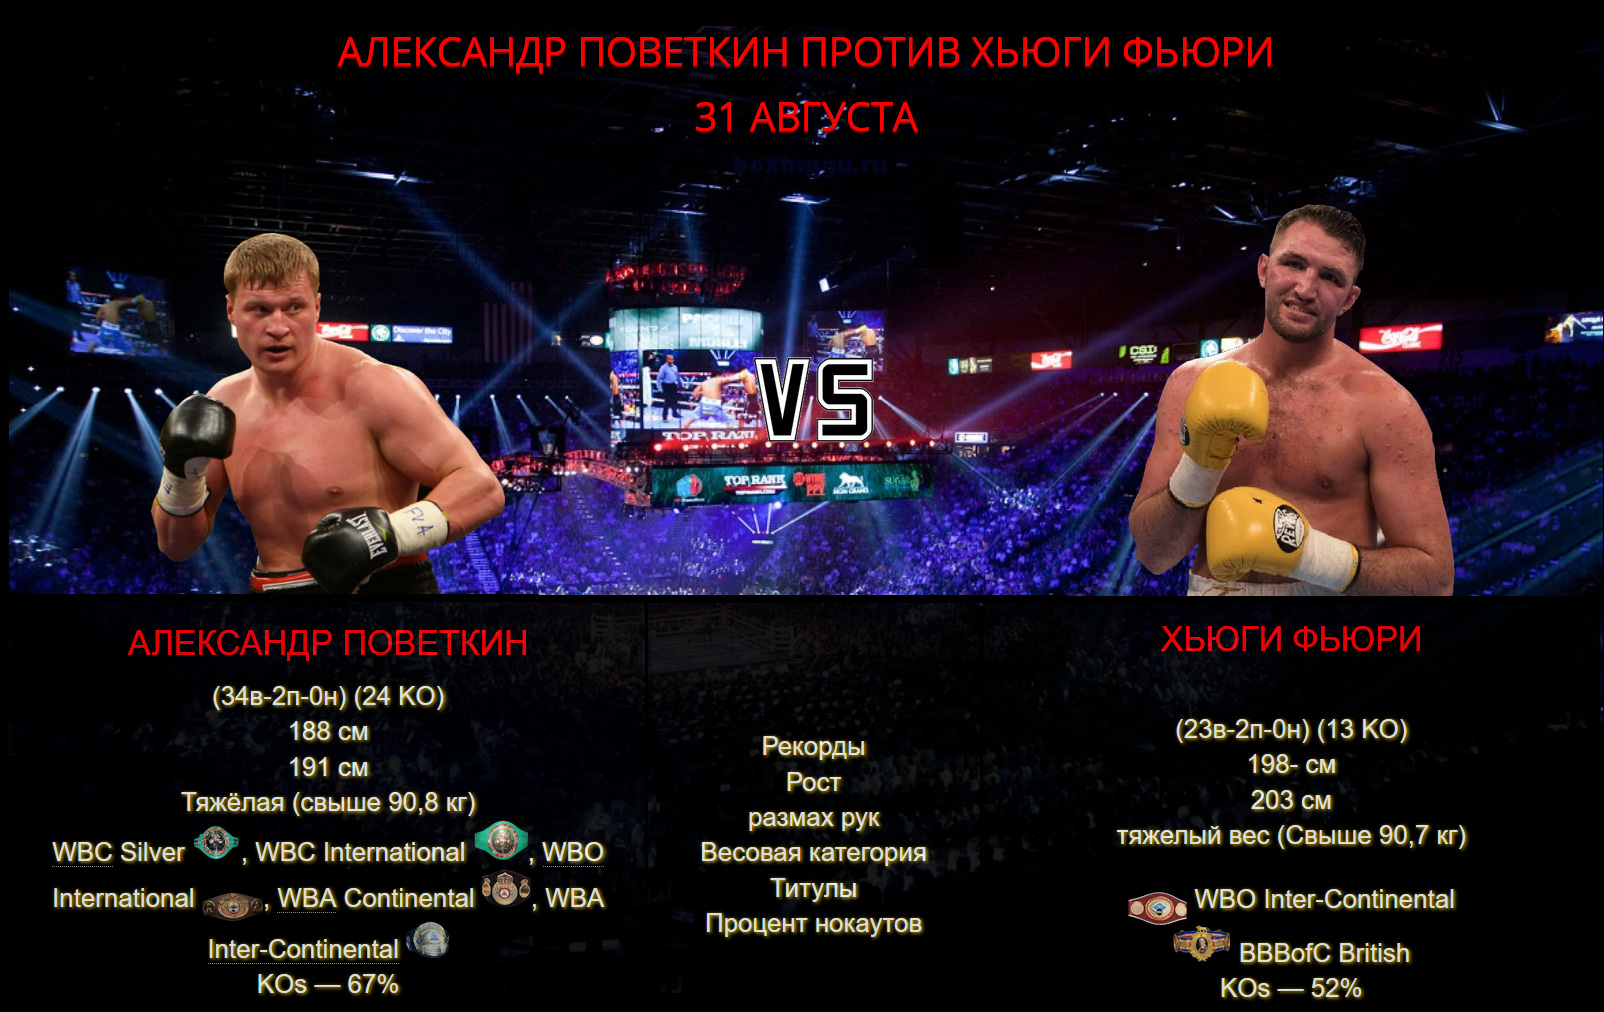 Александр Поветкин - Хьюги Фьюри